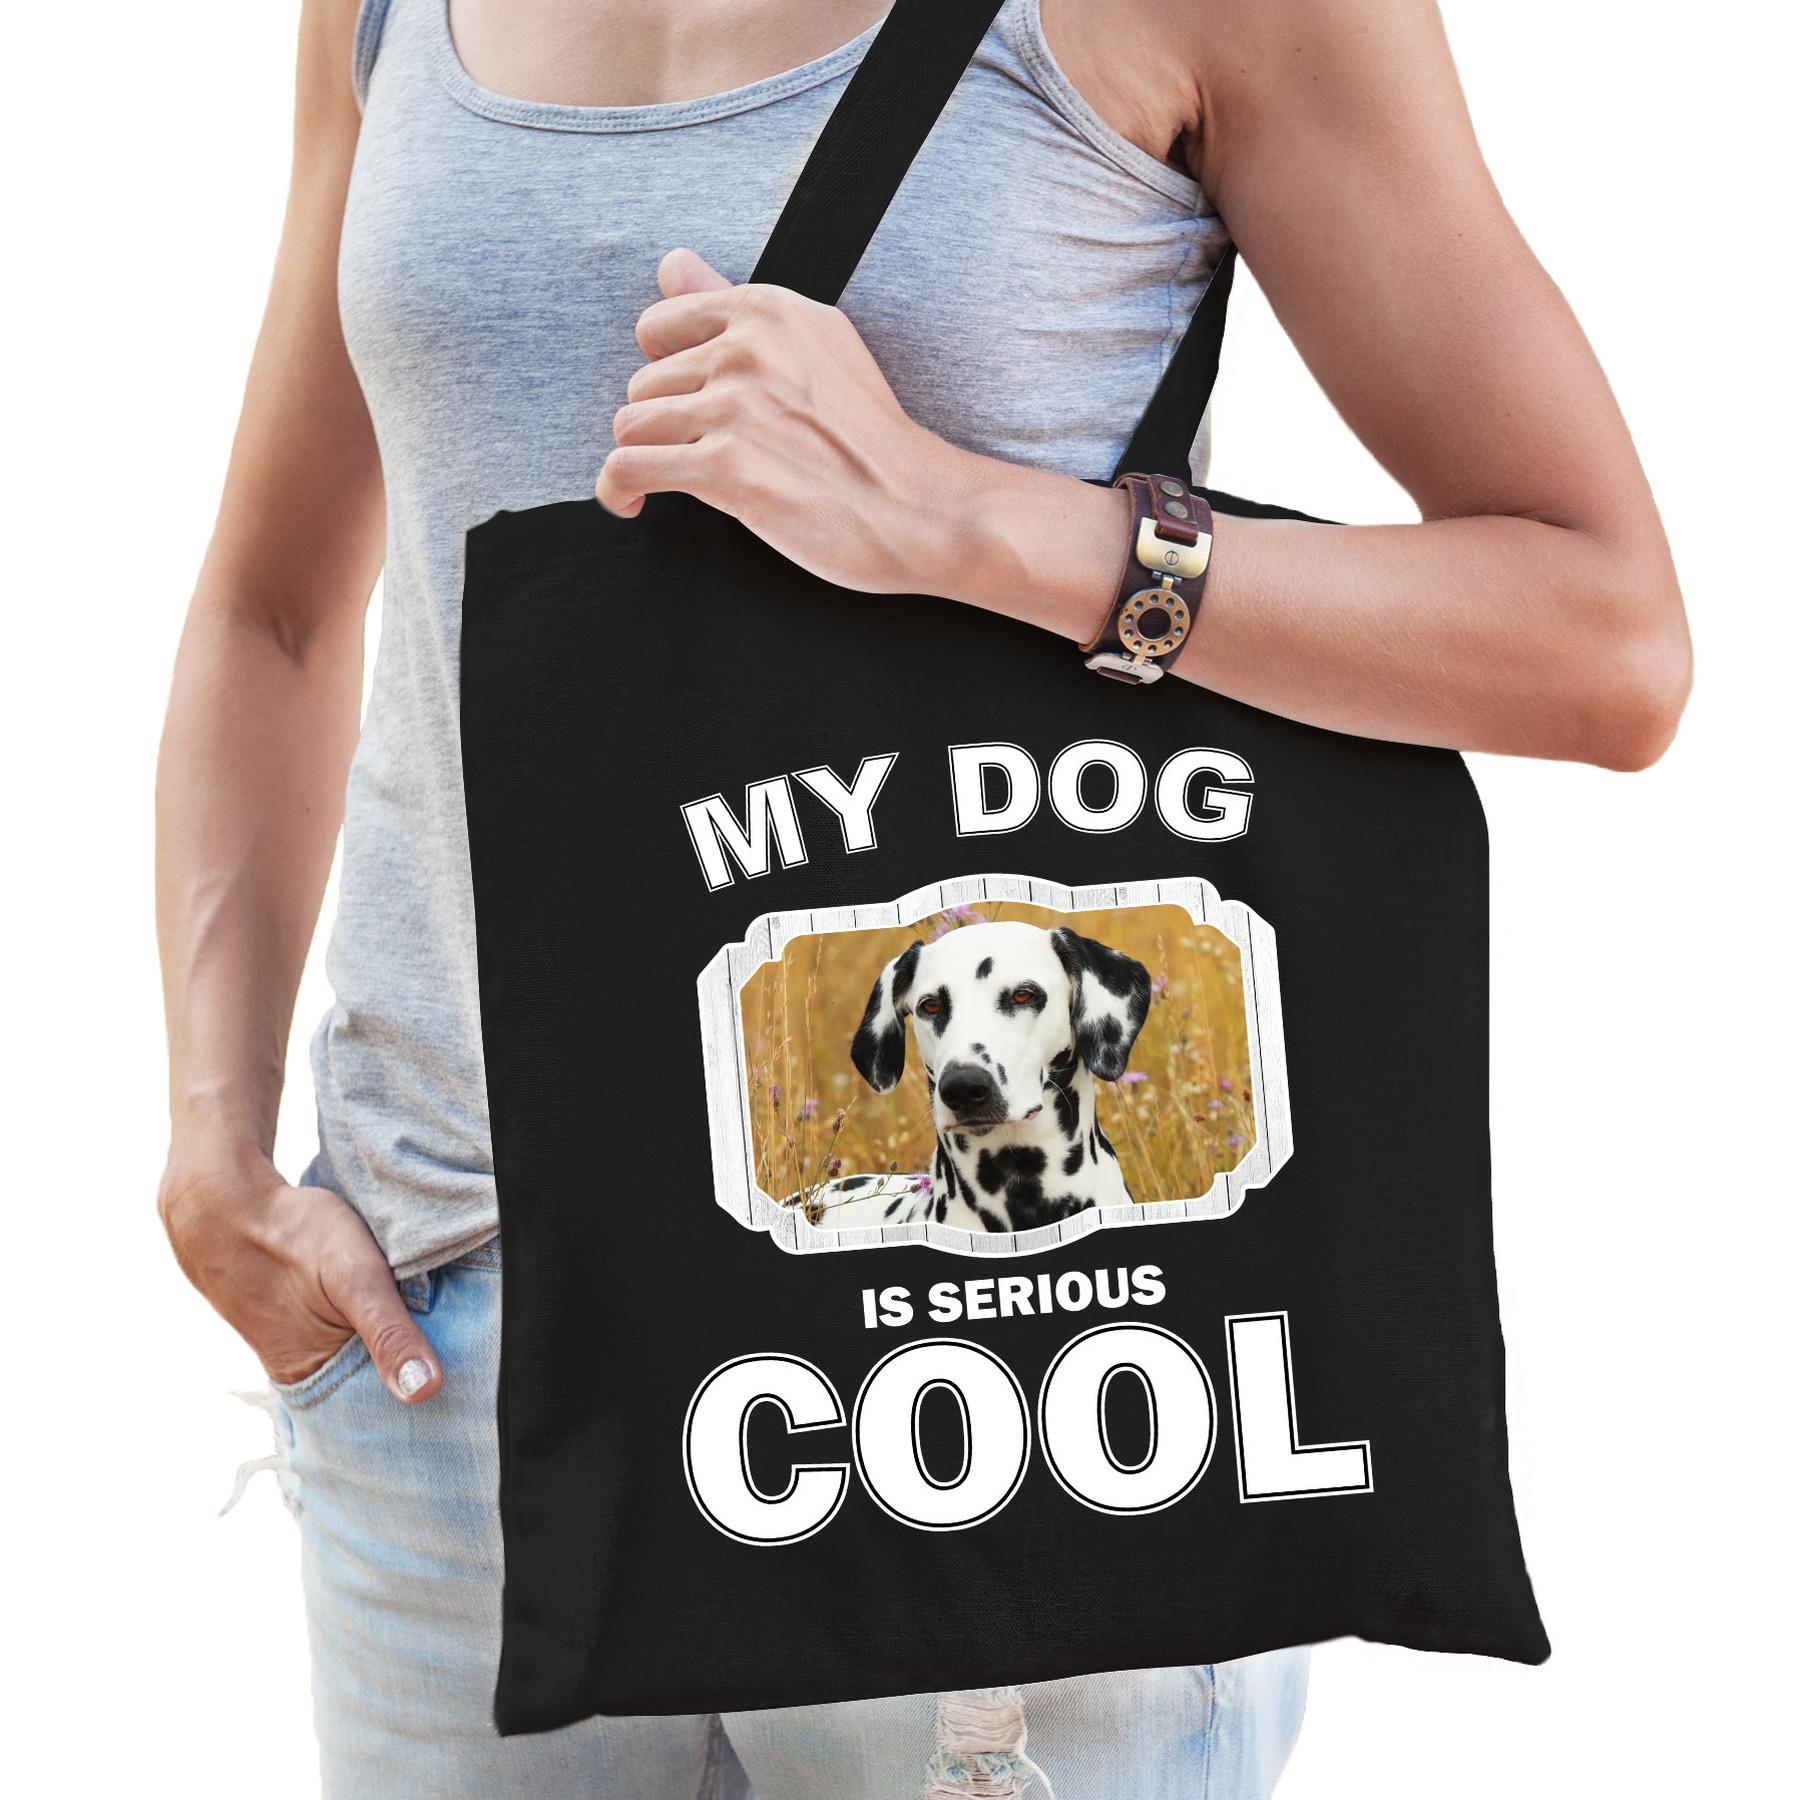 Katoenen tasje my dog is serious cool zwart - Dalmatier honden cadeau tas